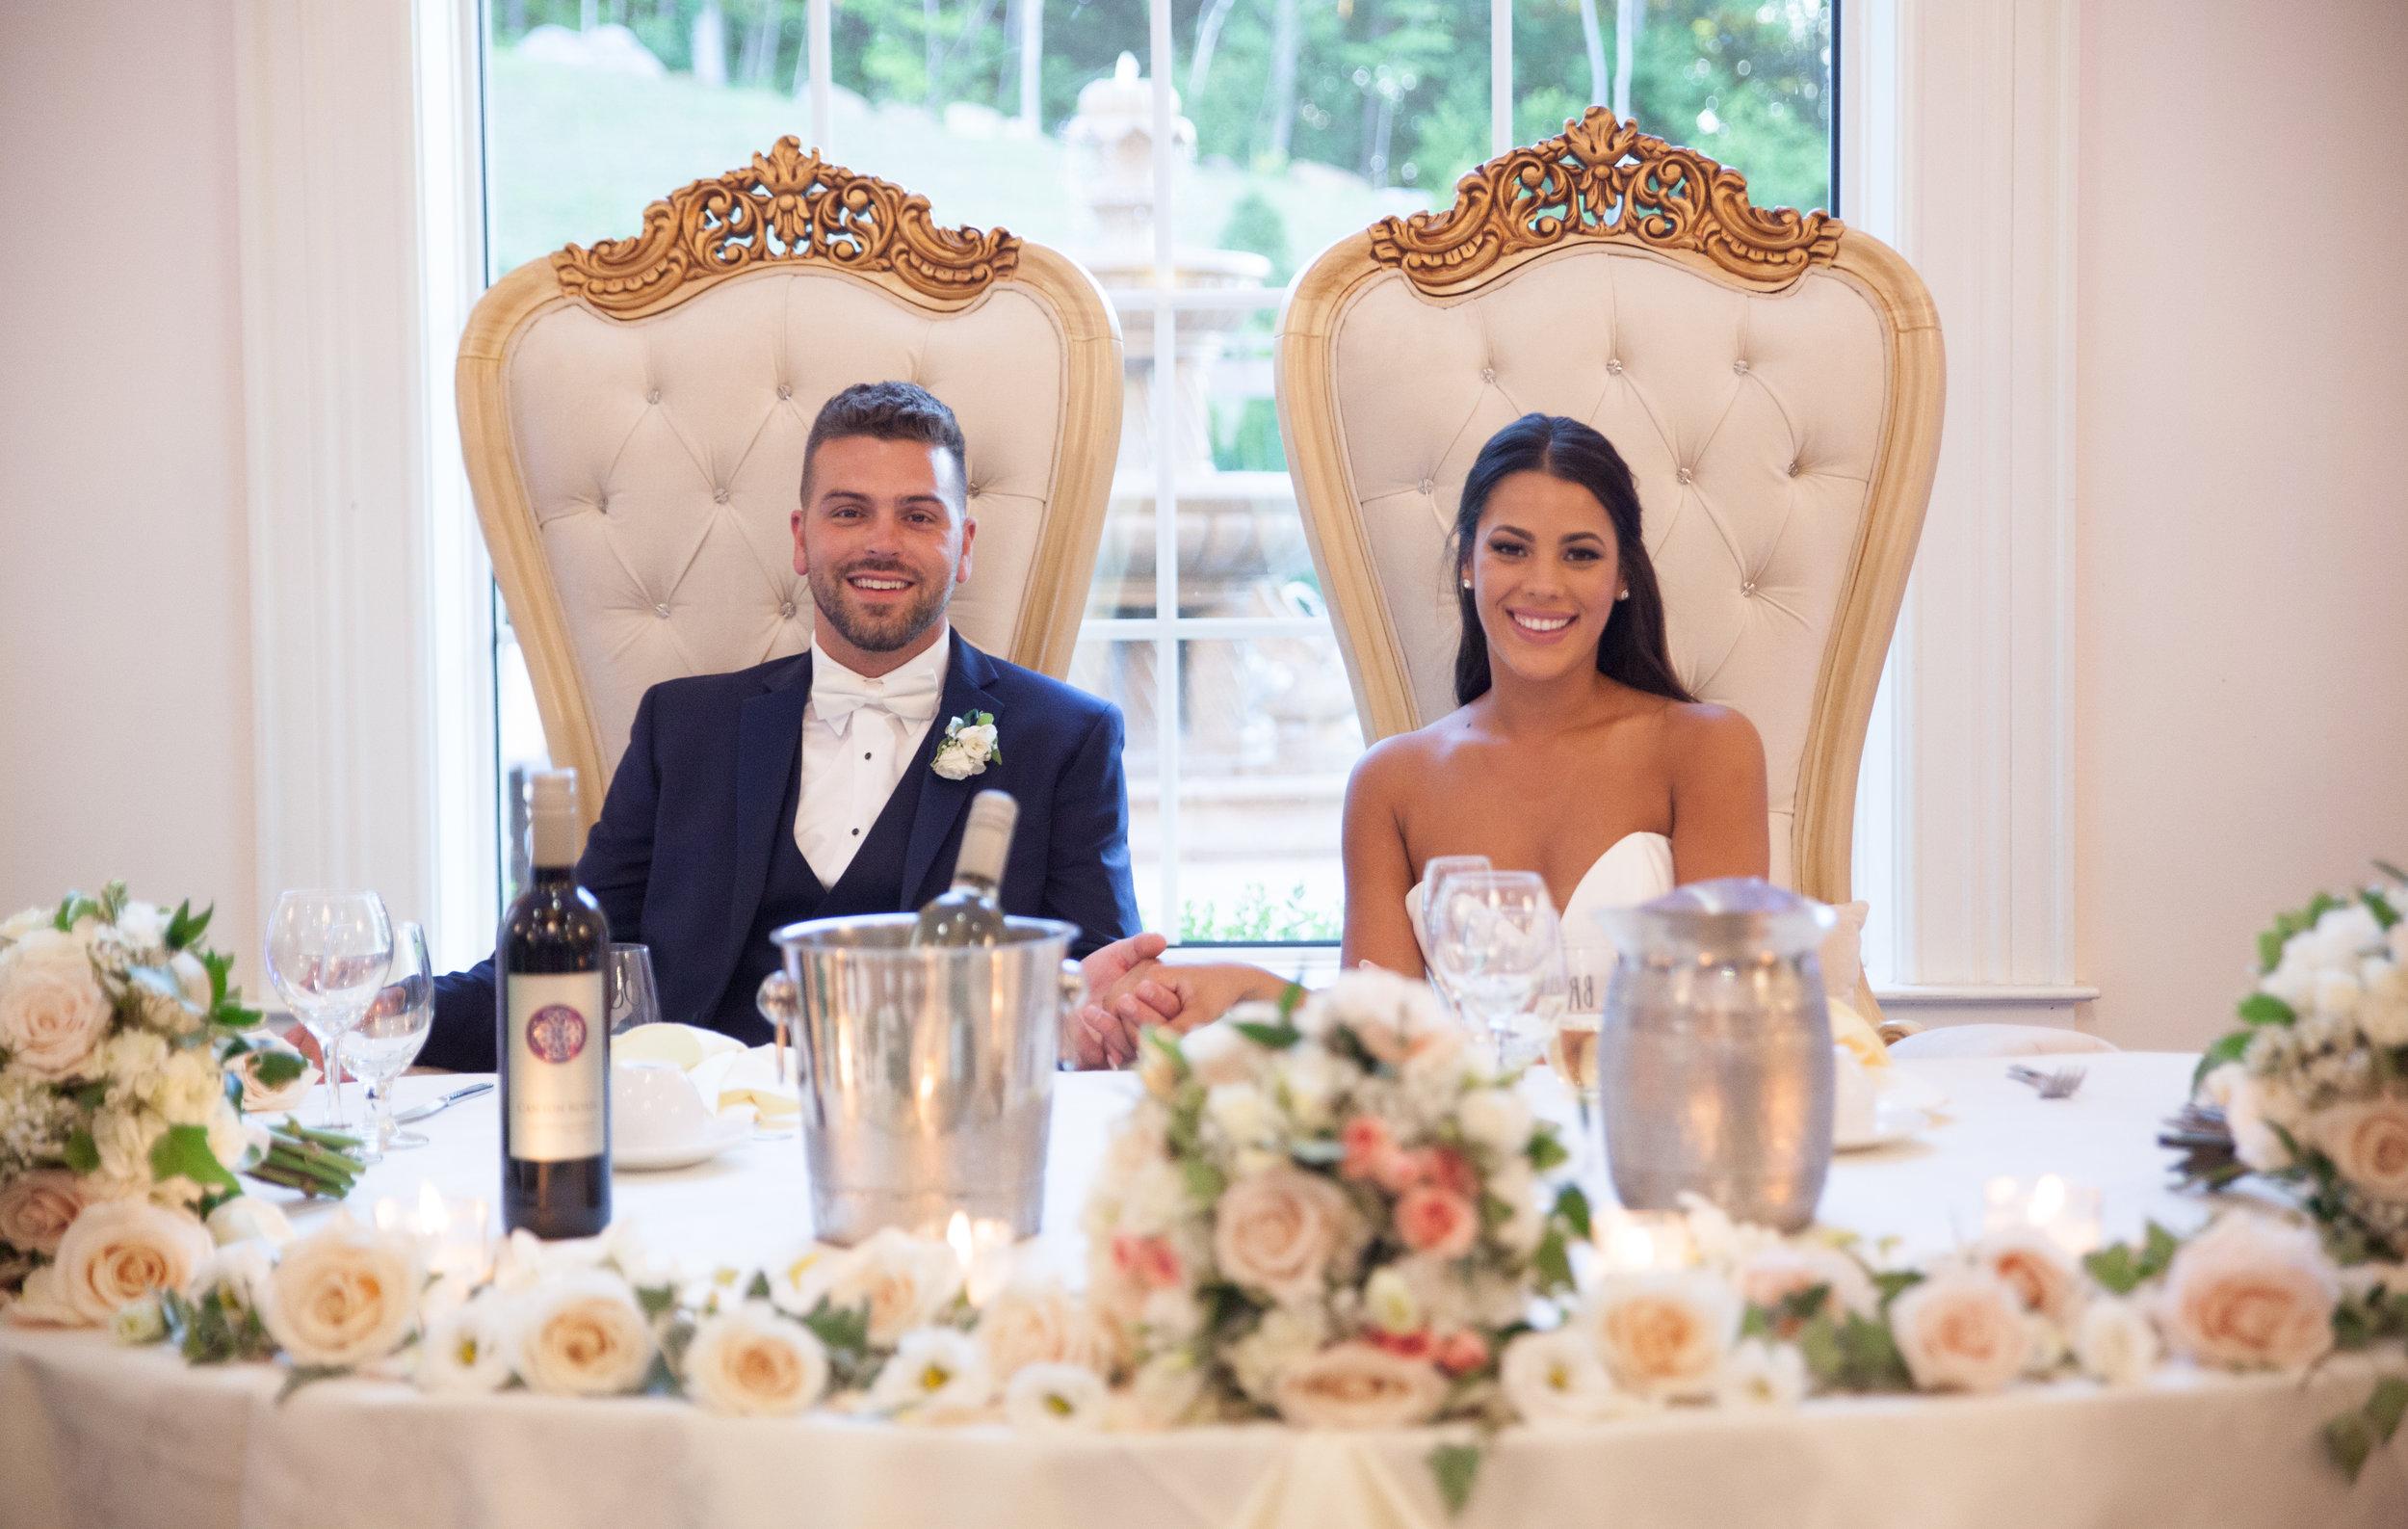 Crystal & Stefan's wedding - Featured Wedding